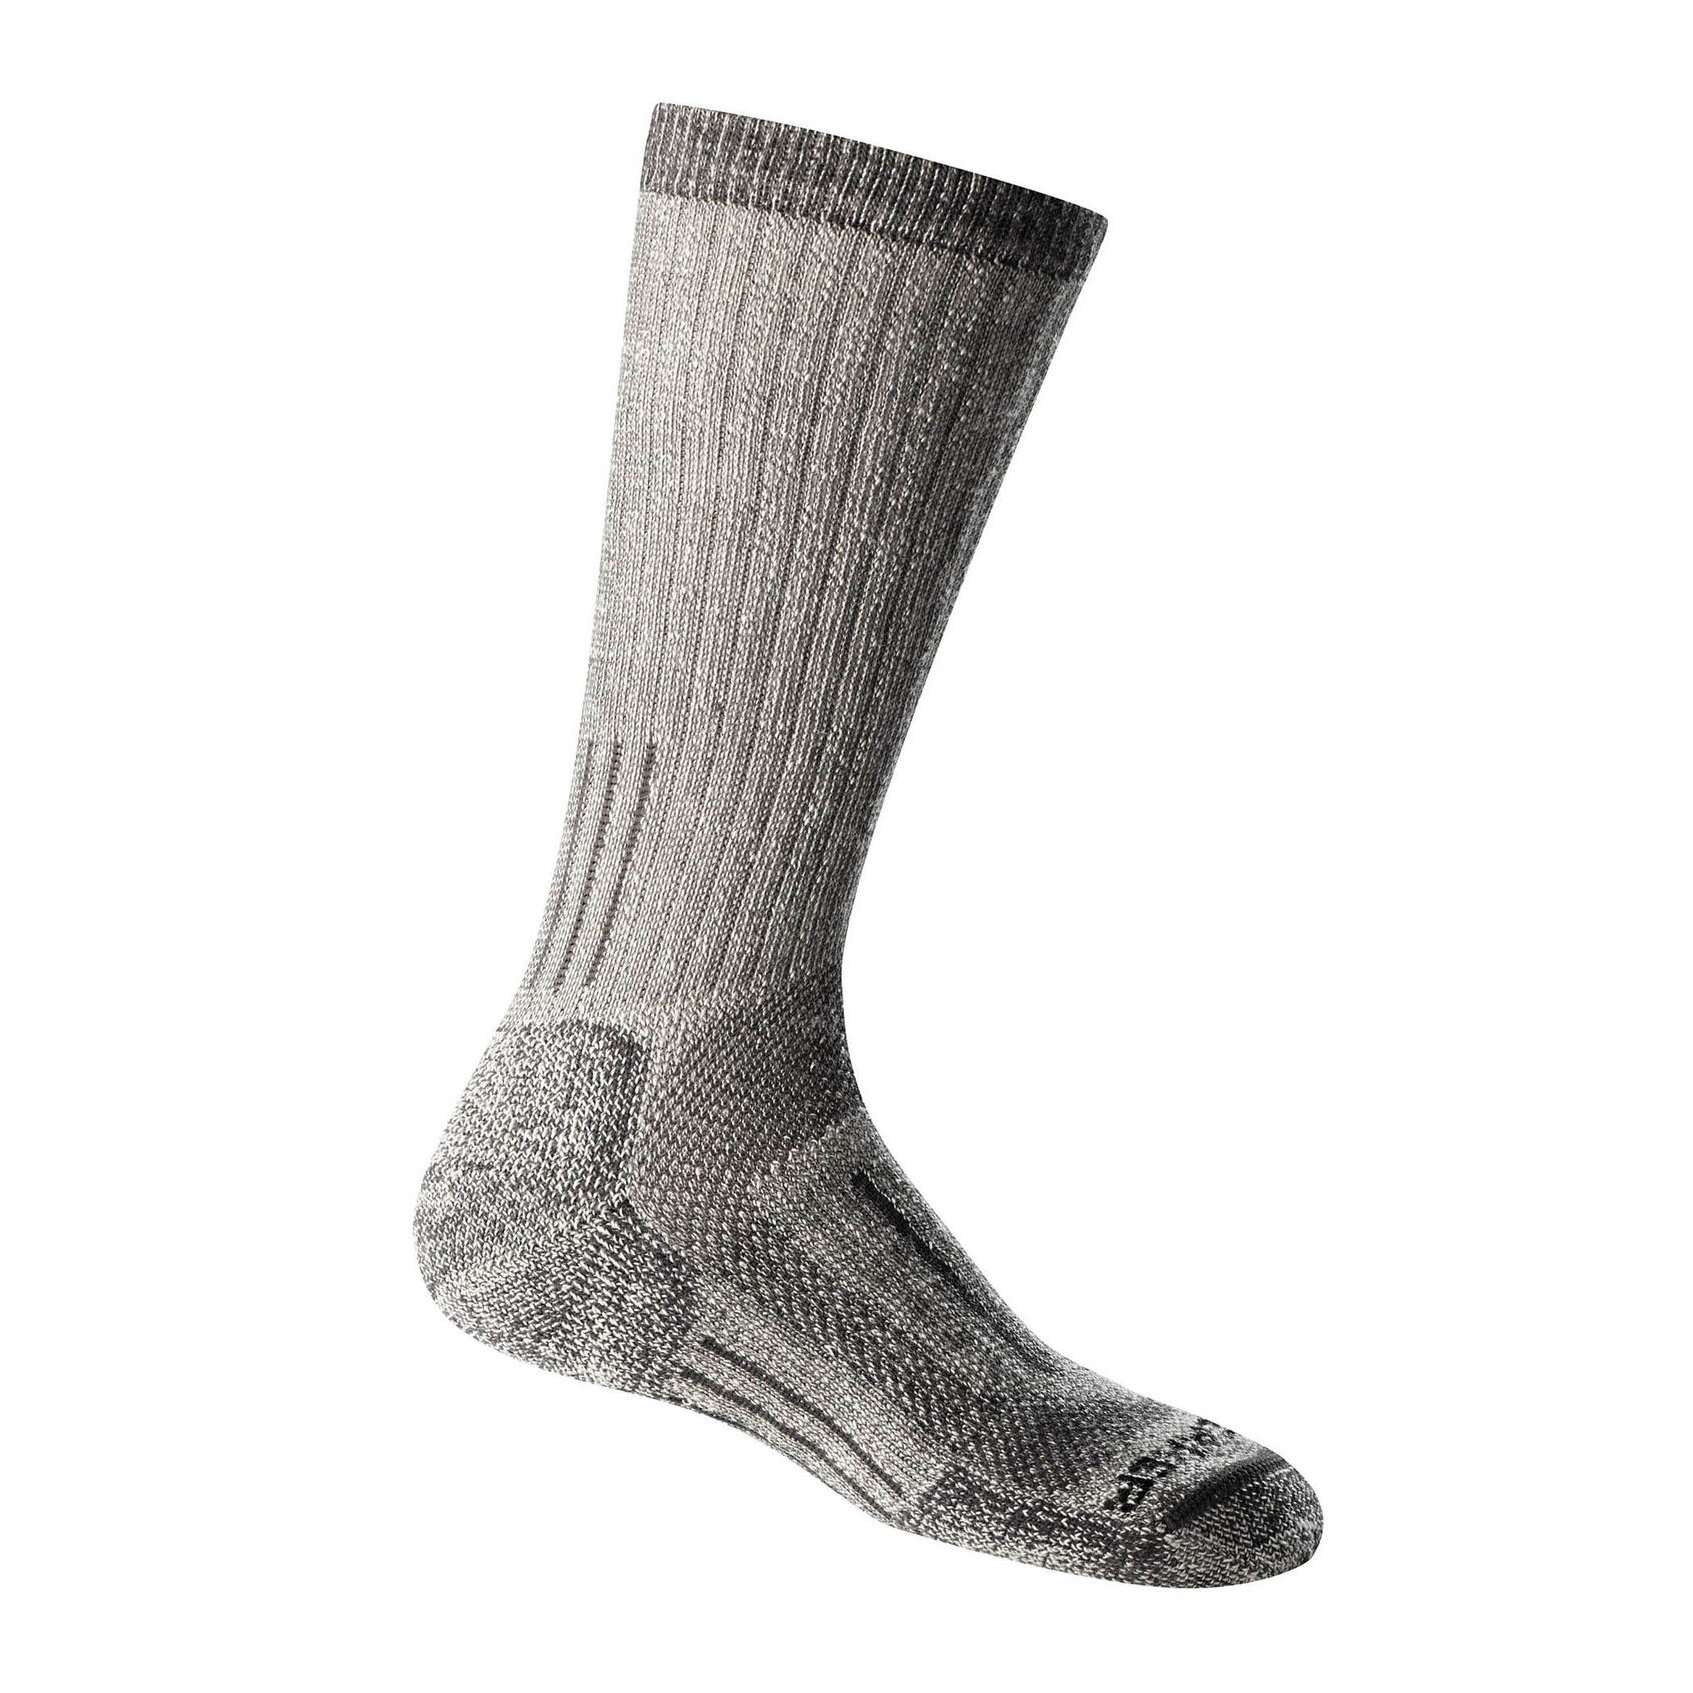 Mountaineer Mid Calf Sock - Women's